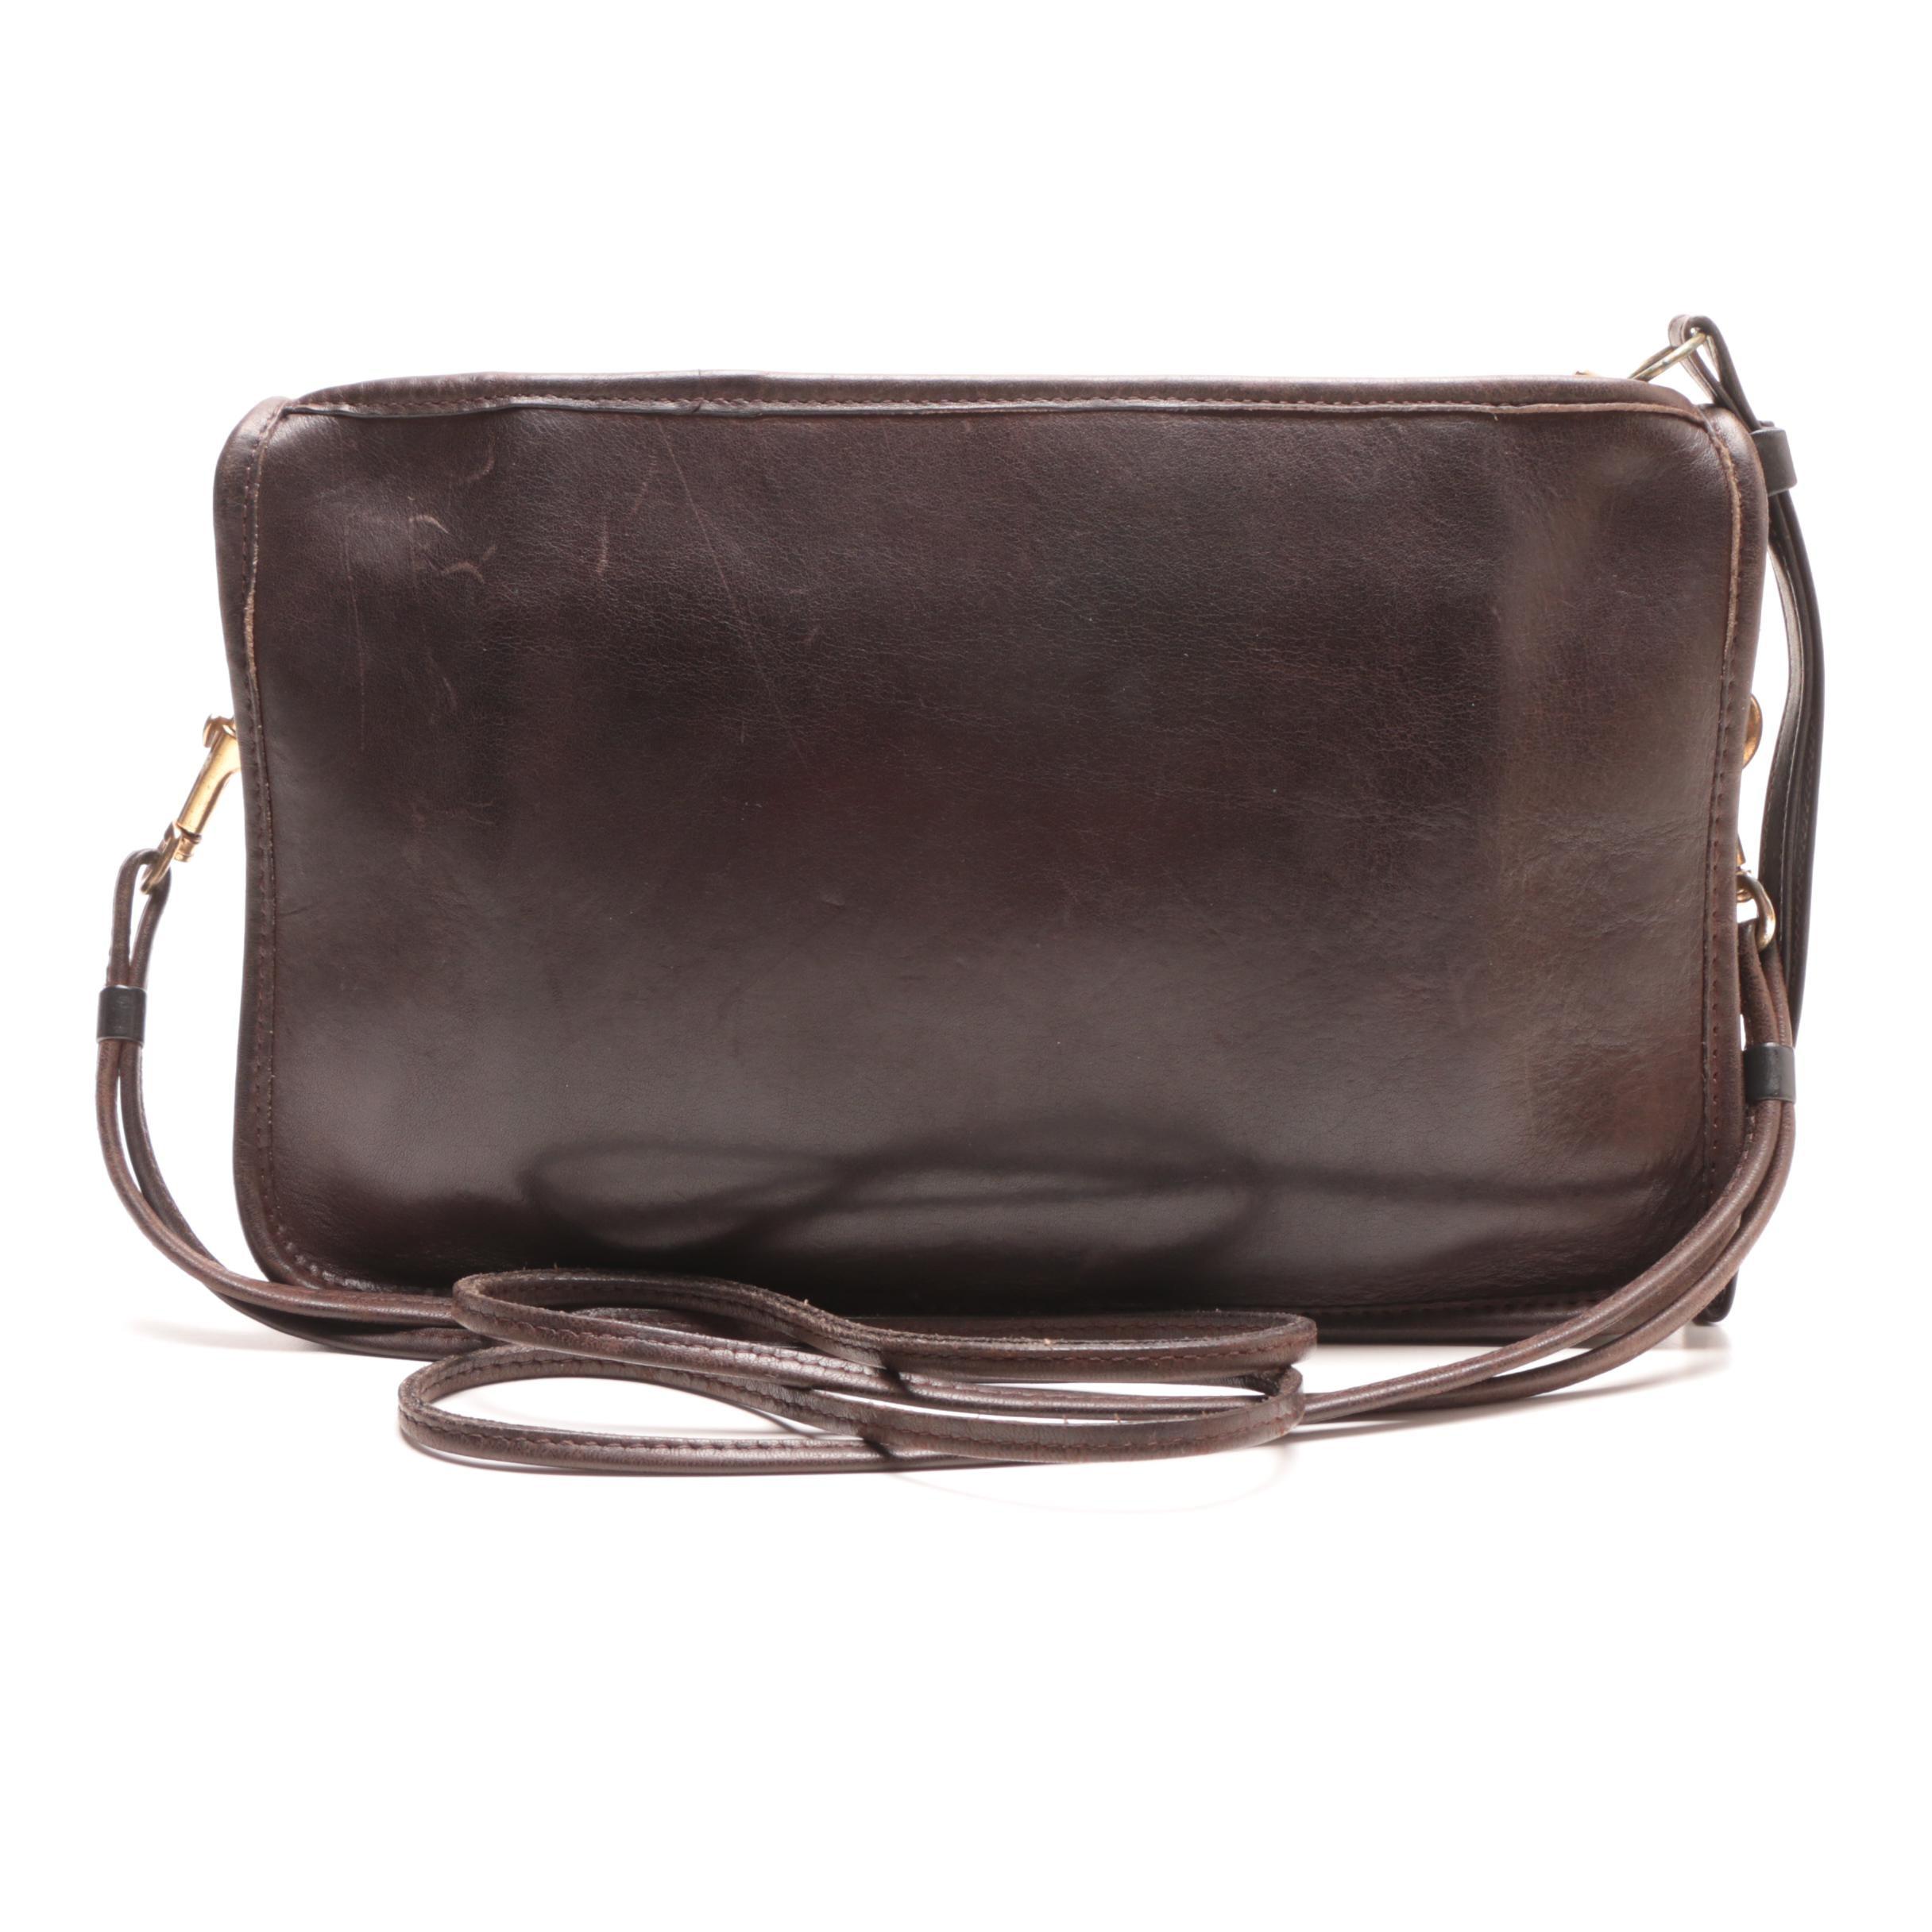 Circa 1970s Vintage Coach Legacy Convertible Clutch Shoulder Bag